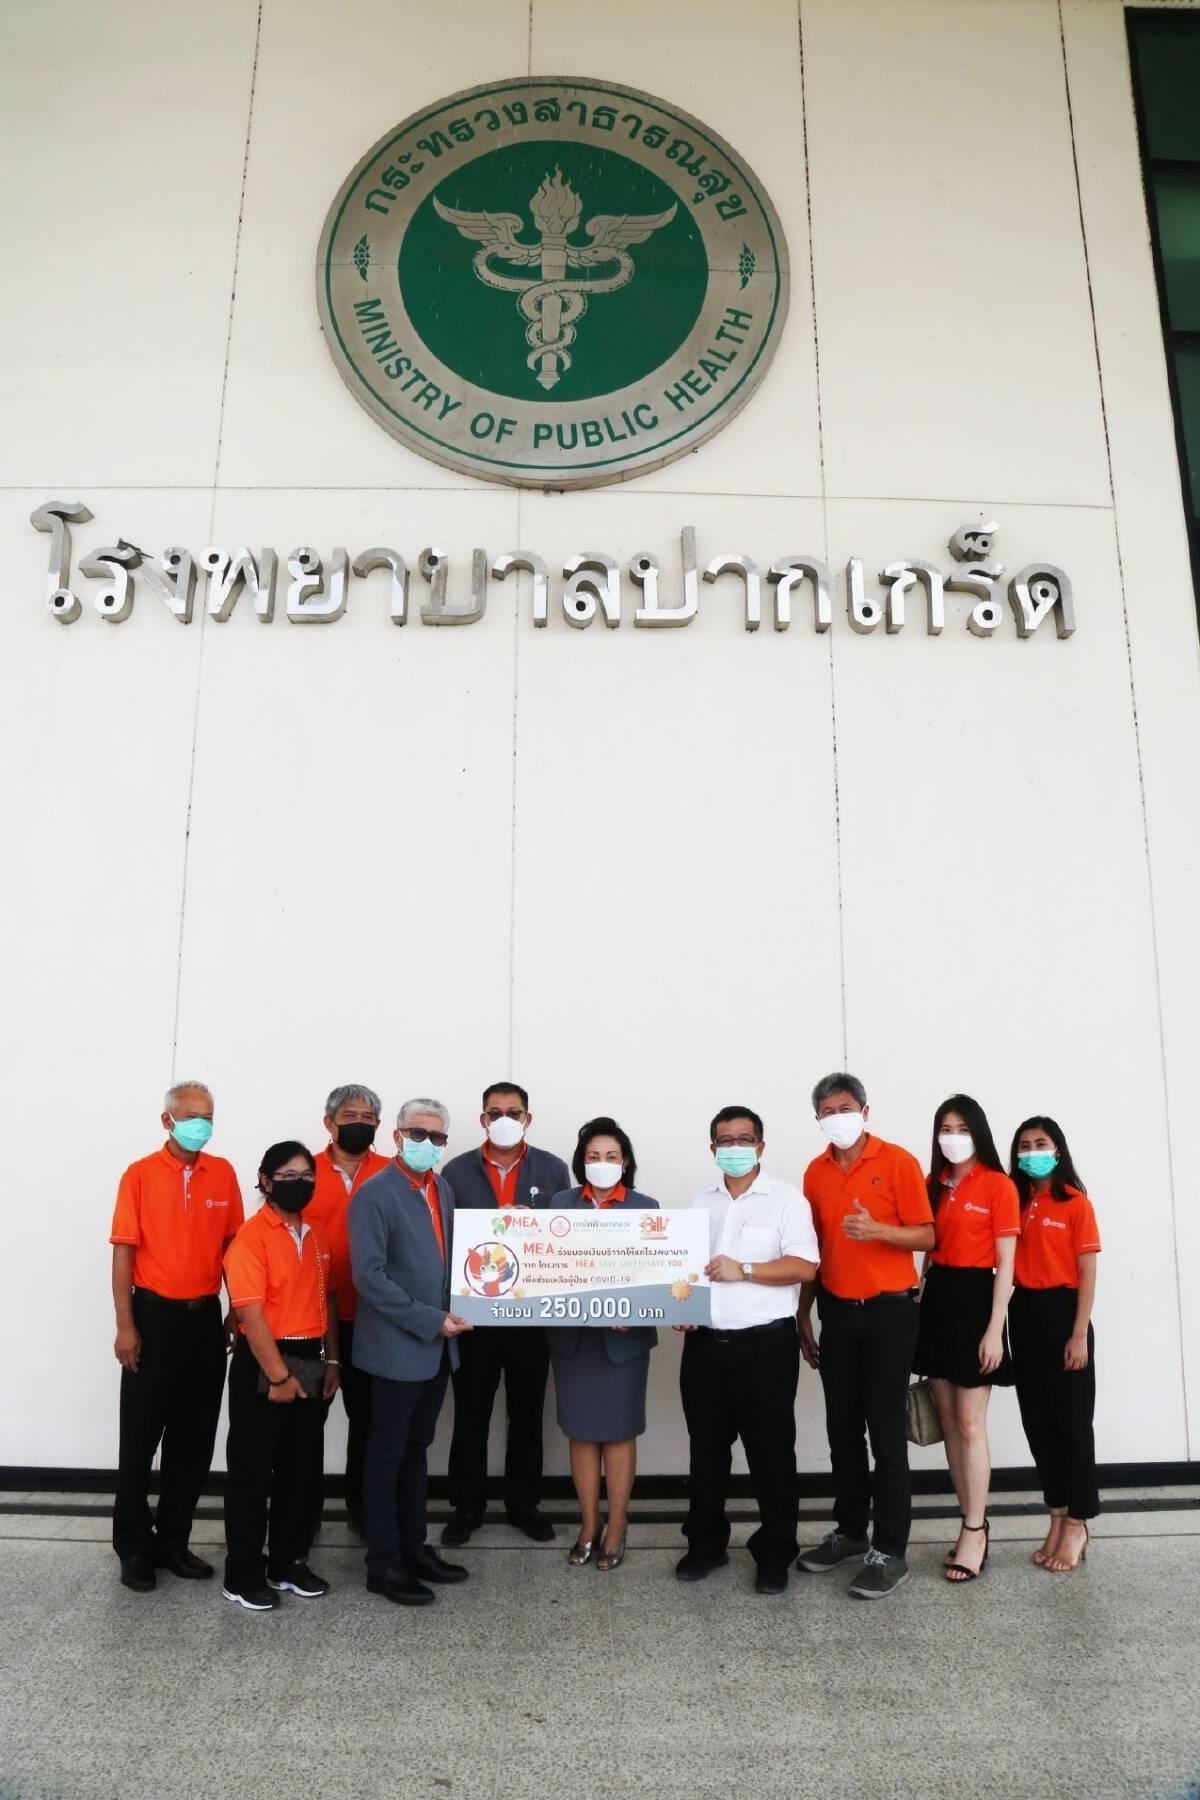 MEA มอบเงินโครงการ MEA Save Green Save You โดยฝ่ายการตลาดและลูกค้าสัมพันธ์ รวม 1 ล้านบาท ให้ รพ. ช่วยเหลือผู้ป่วย COVID-19